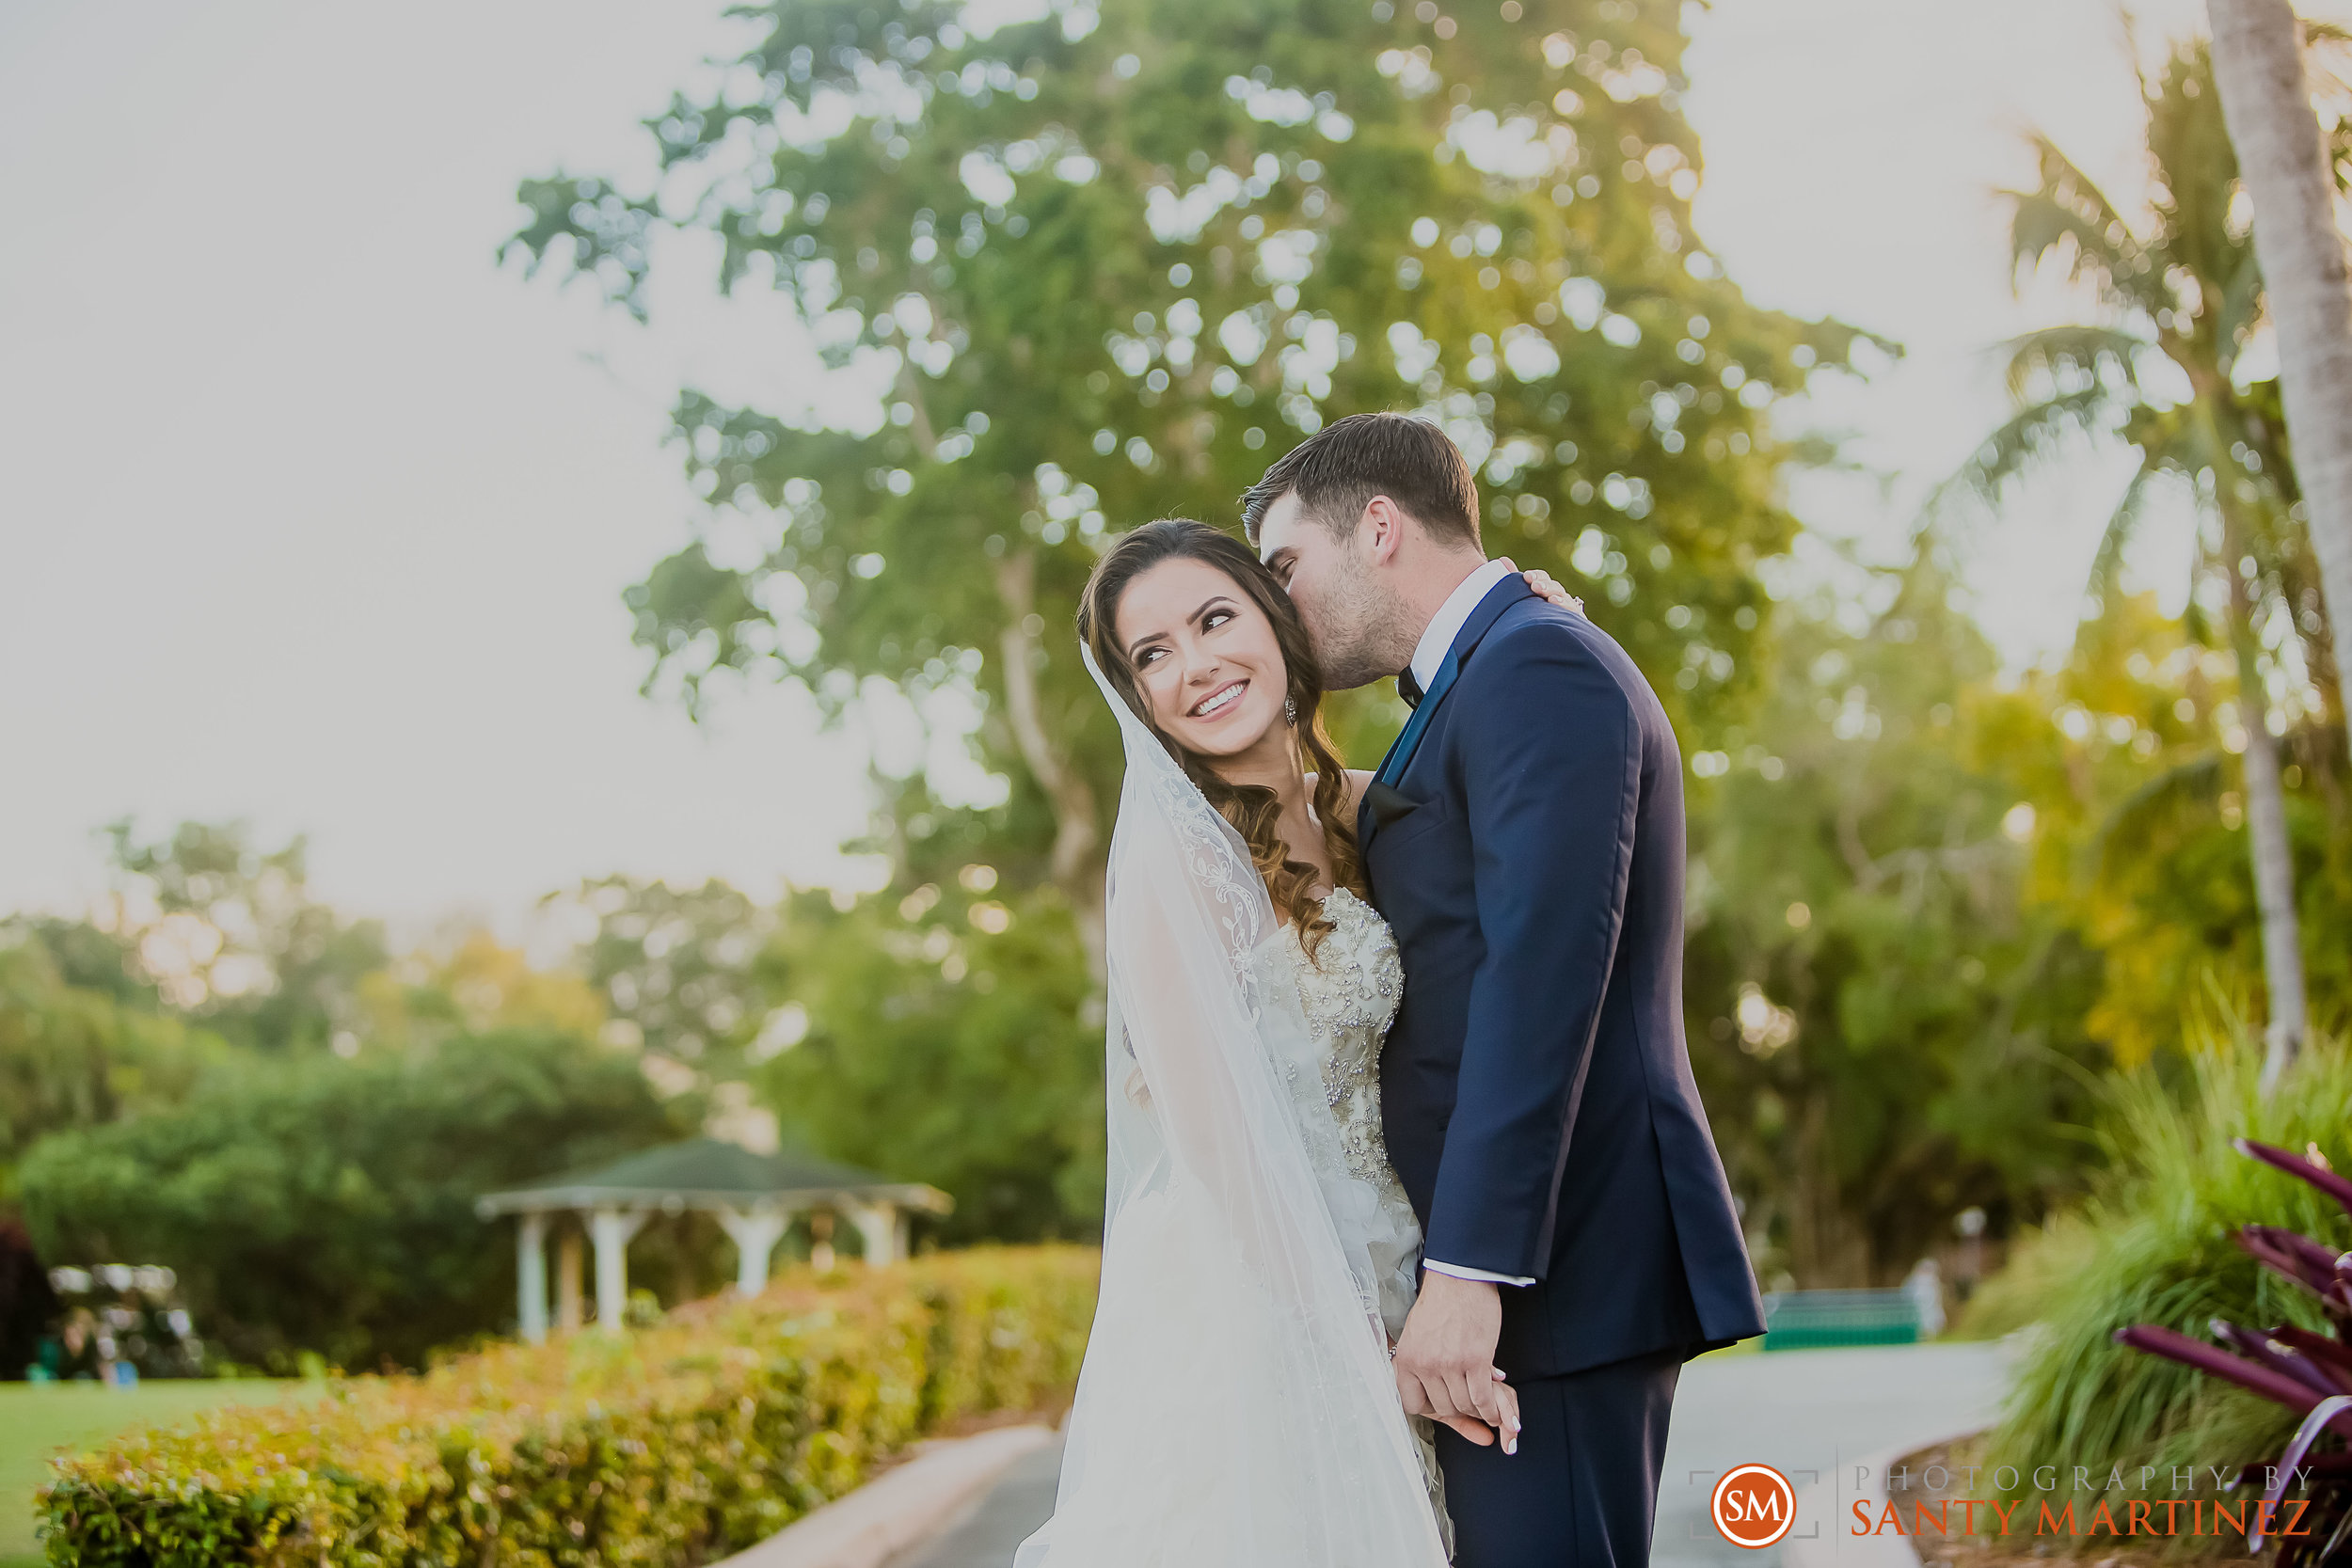 Wedding Coral Gables Country Club - Santy Martinez Photography-16.jpg